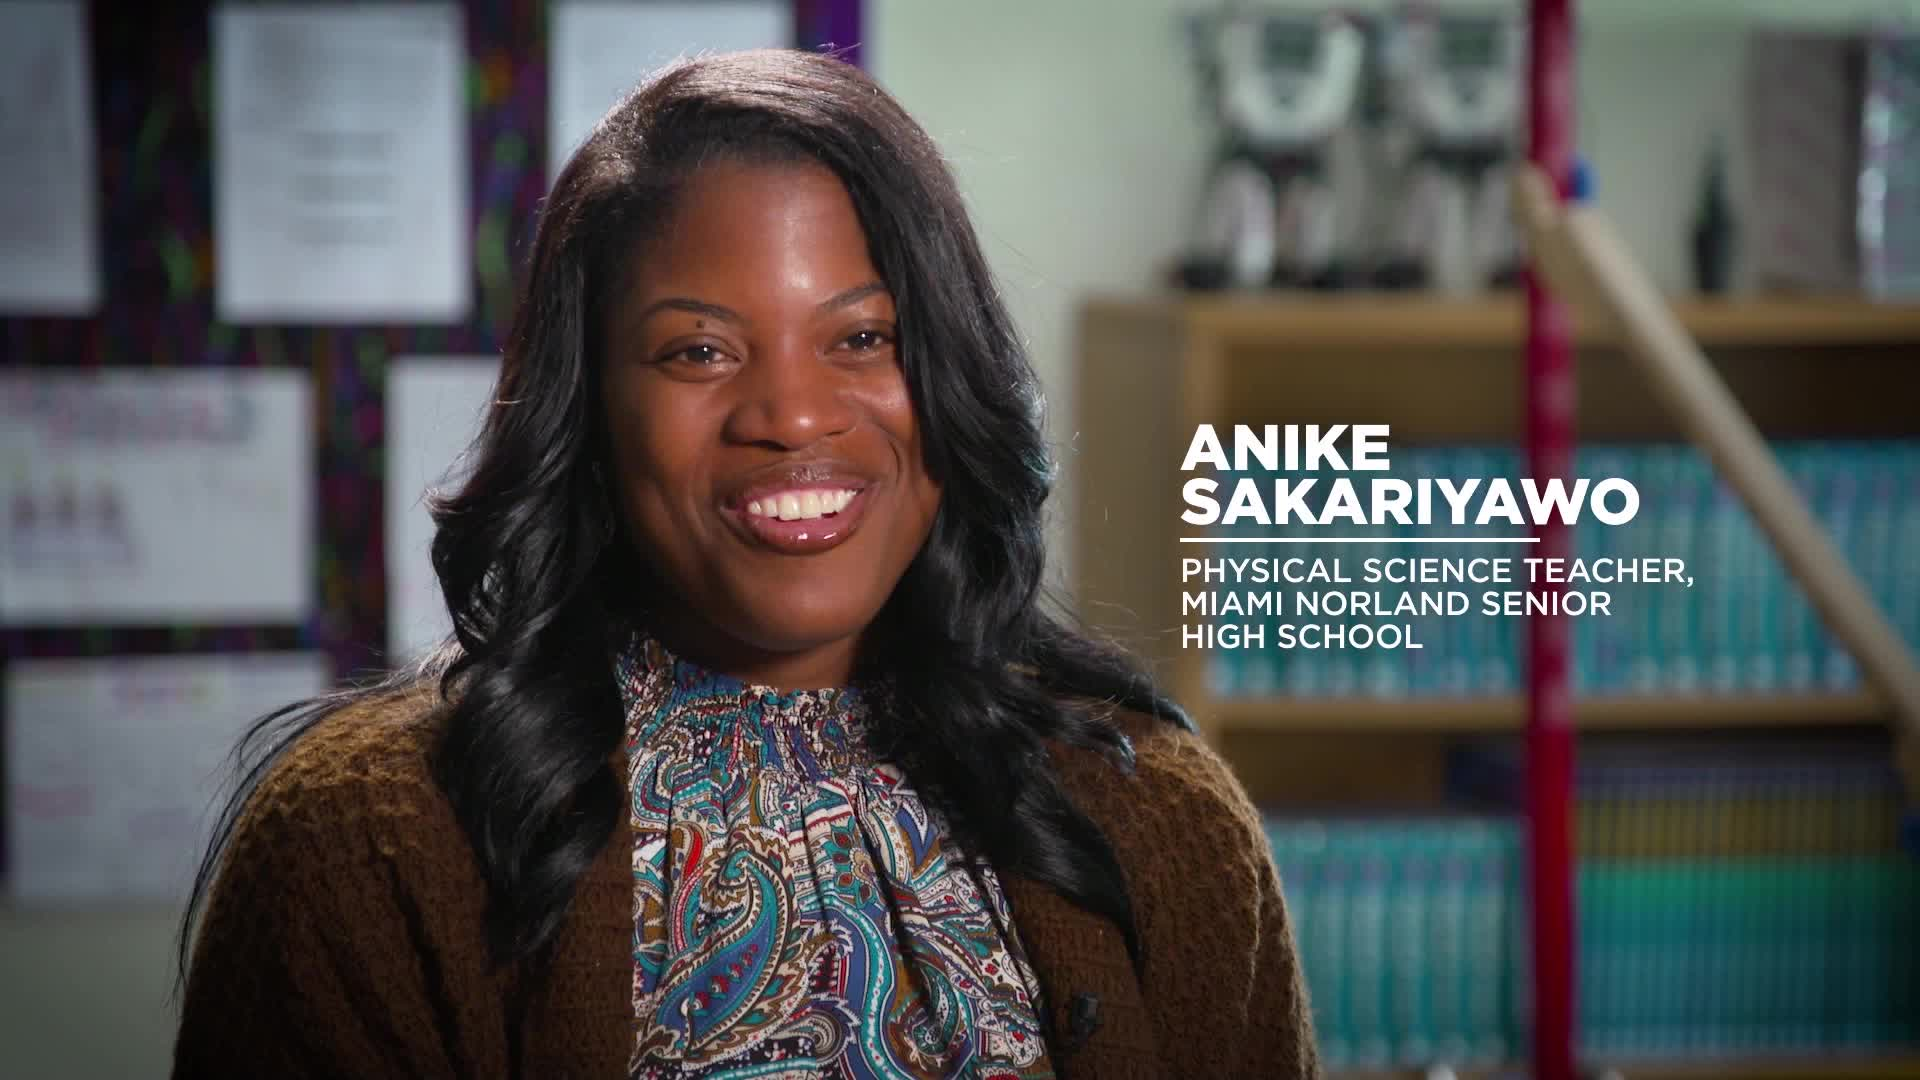 Harmony of the Seas Godmother Search Finalist: Anike Sakariyawo, Physical Science Teacher, Miami Norland Senior High School. For more information, visit royalcaribbeanpresscenter.com.